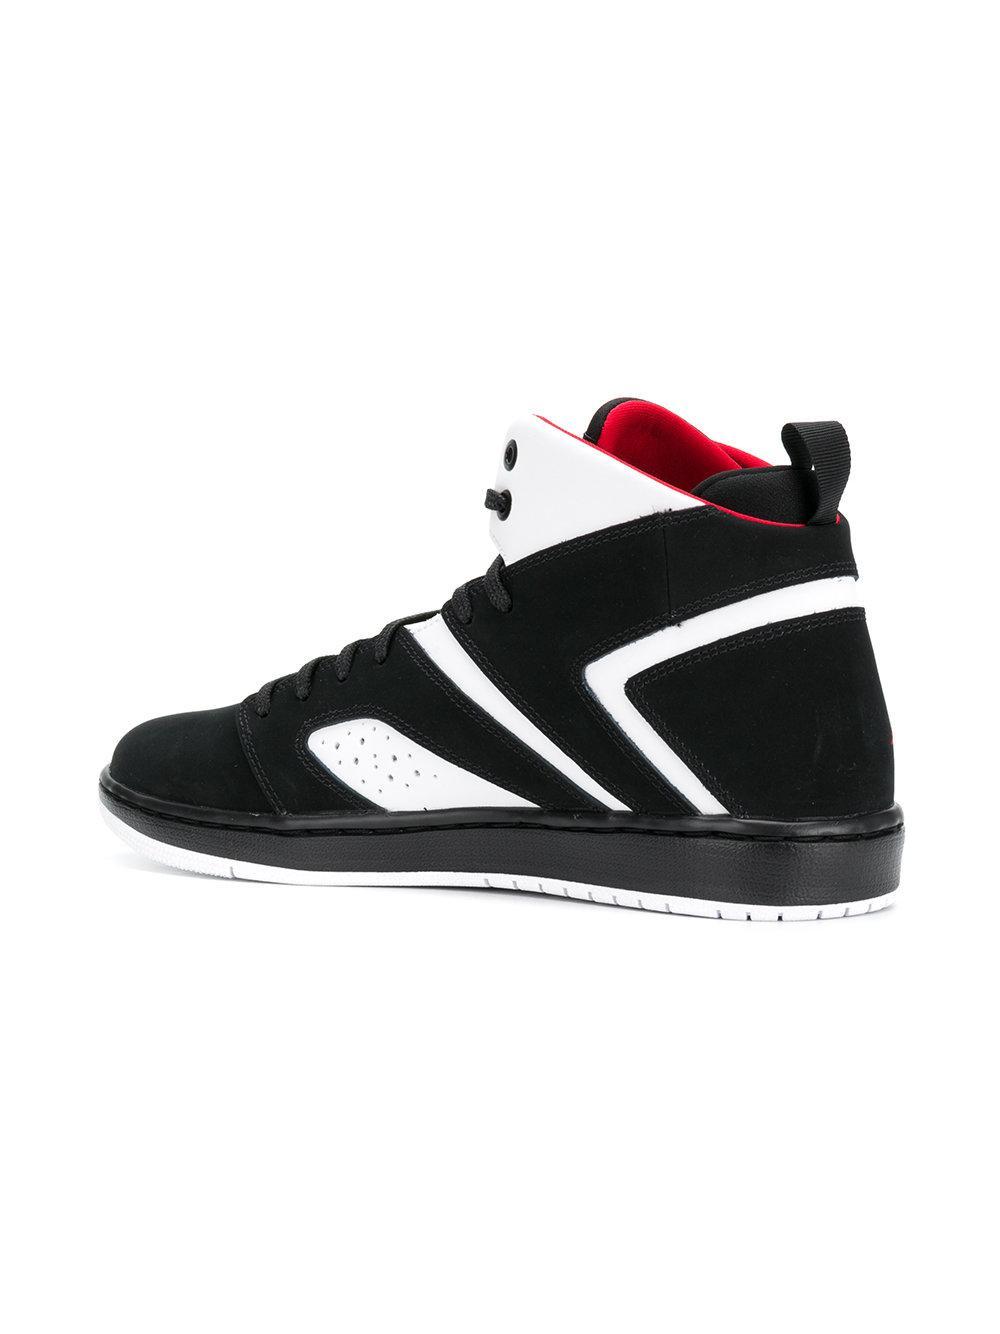 Nike - Black Jordan Flight Legend Sneakers for Men - Lyst. View fullscreen 0bb84b4b198